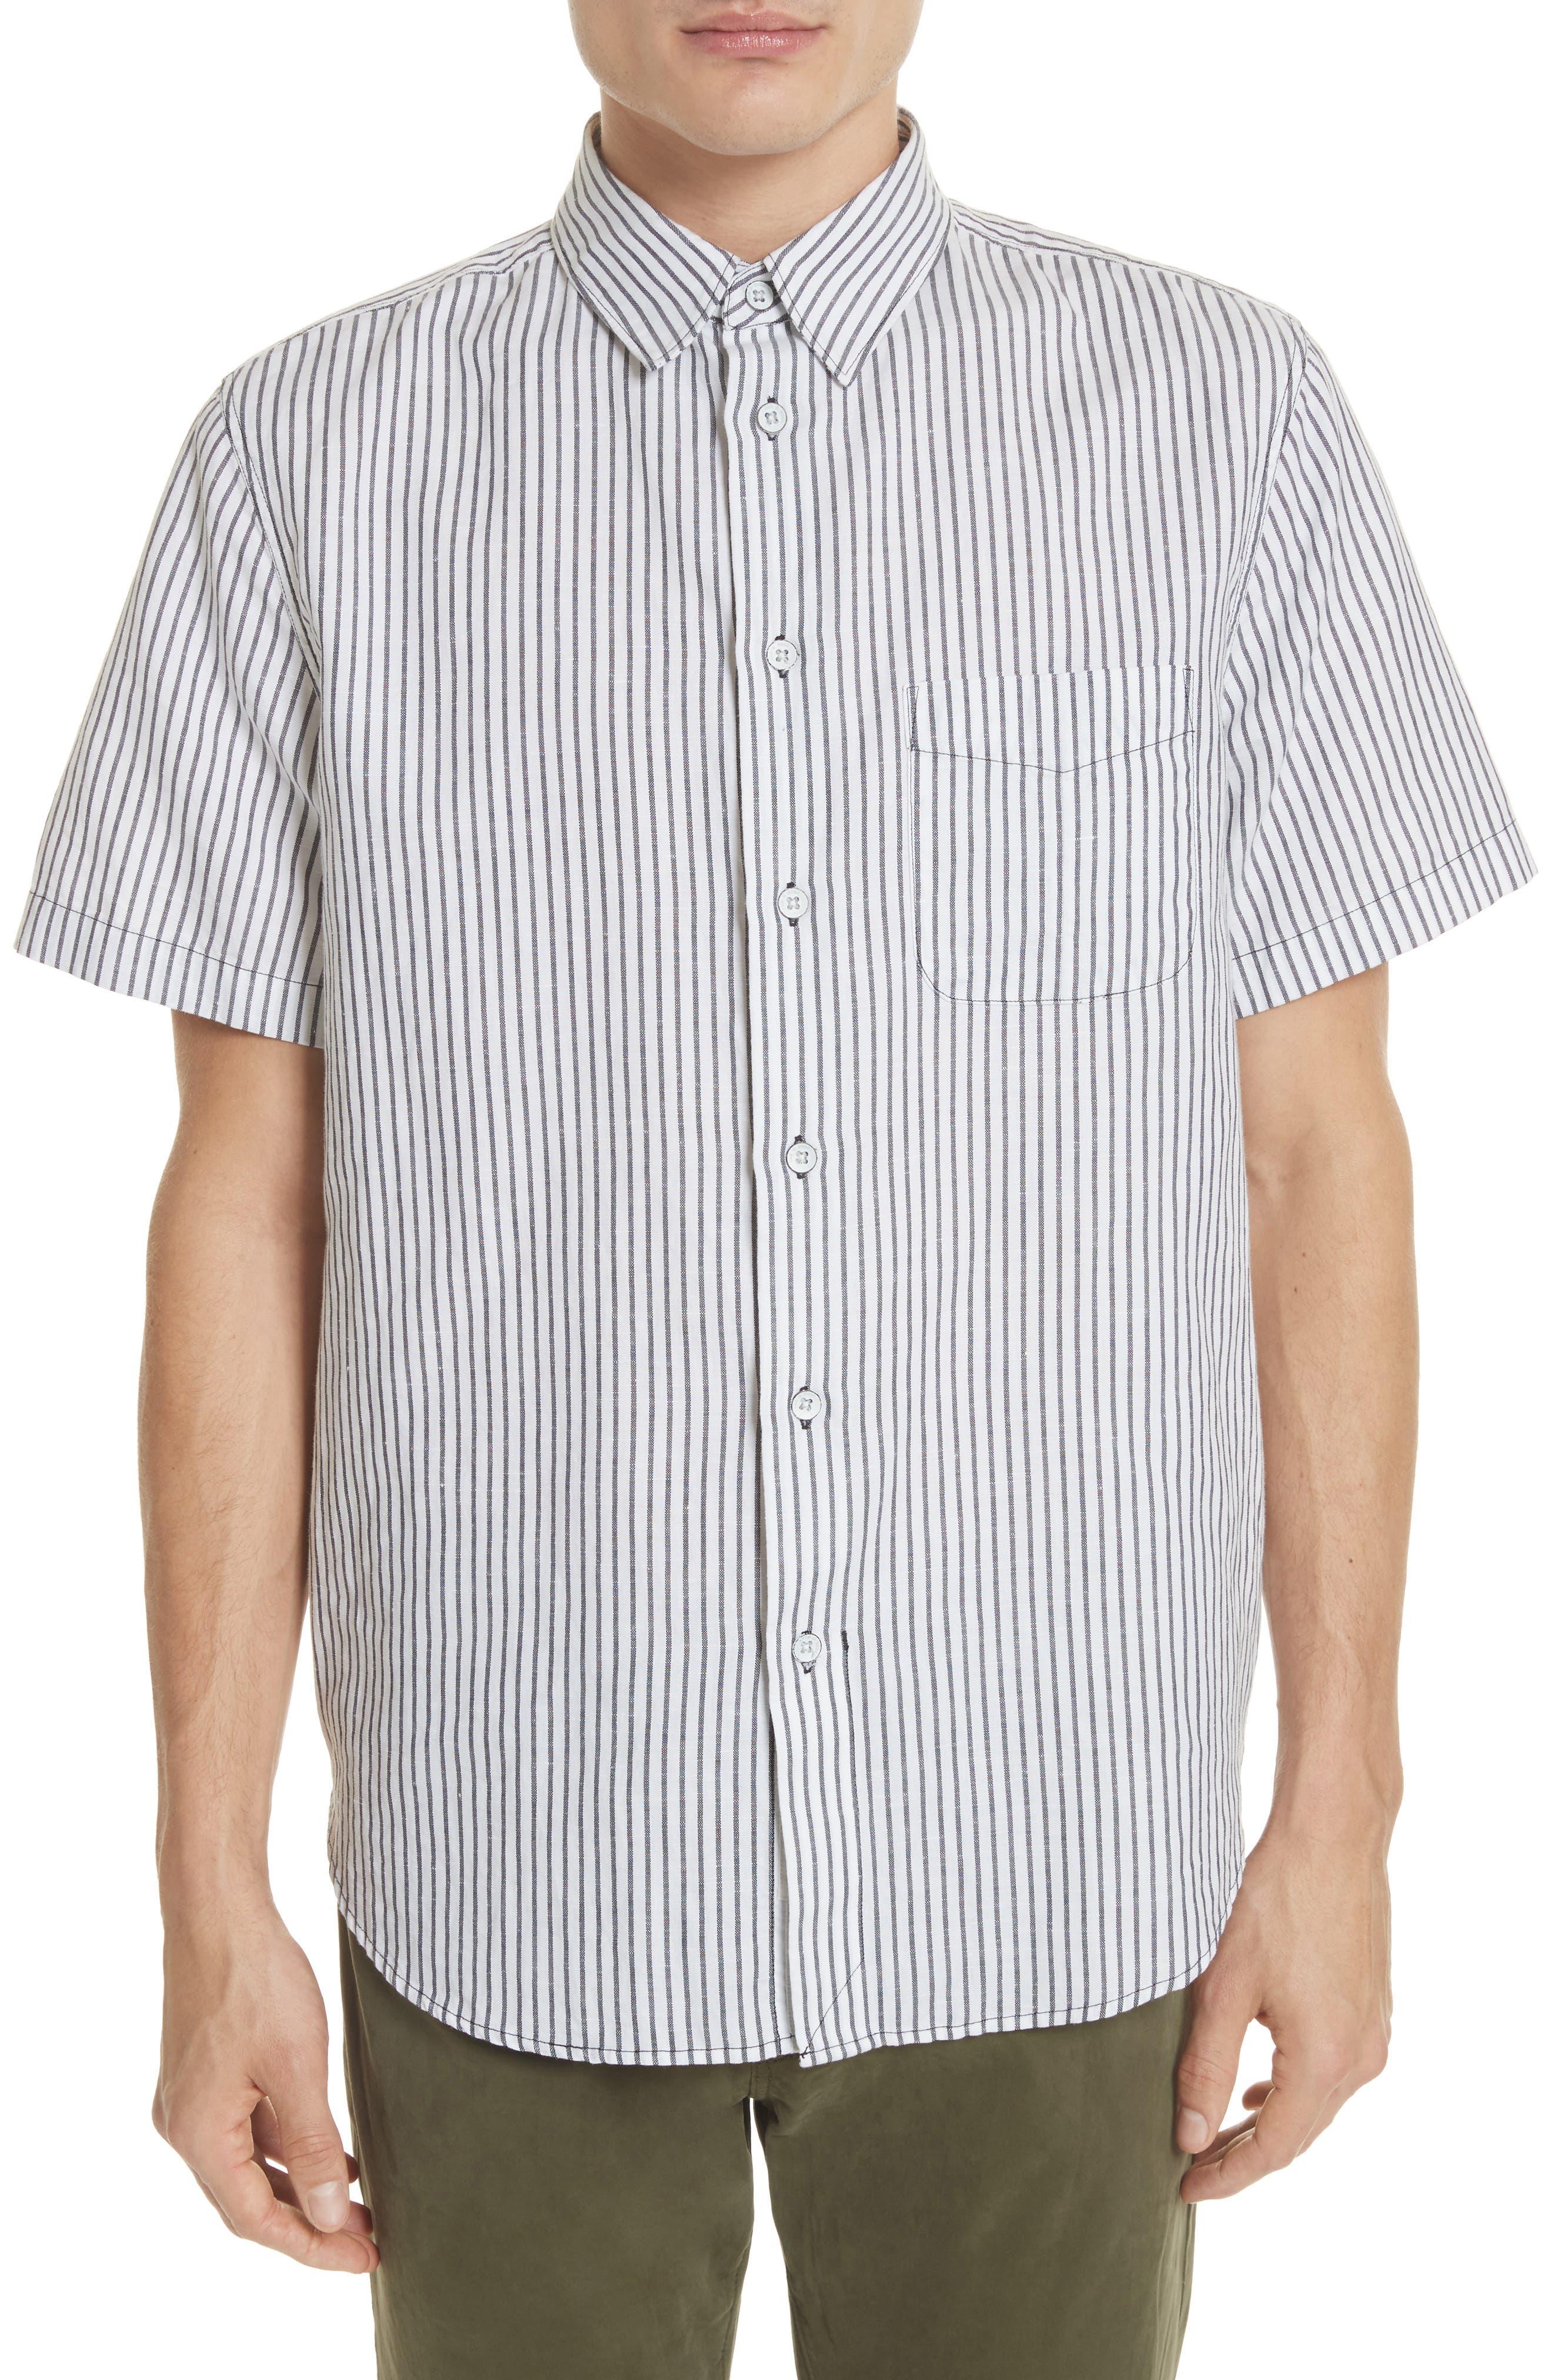 Stripe Short Sleeve Sport Shirt,                             Main thumbnail 1, color,                             White/Navy